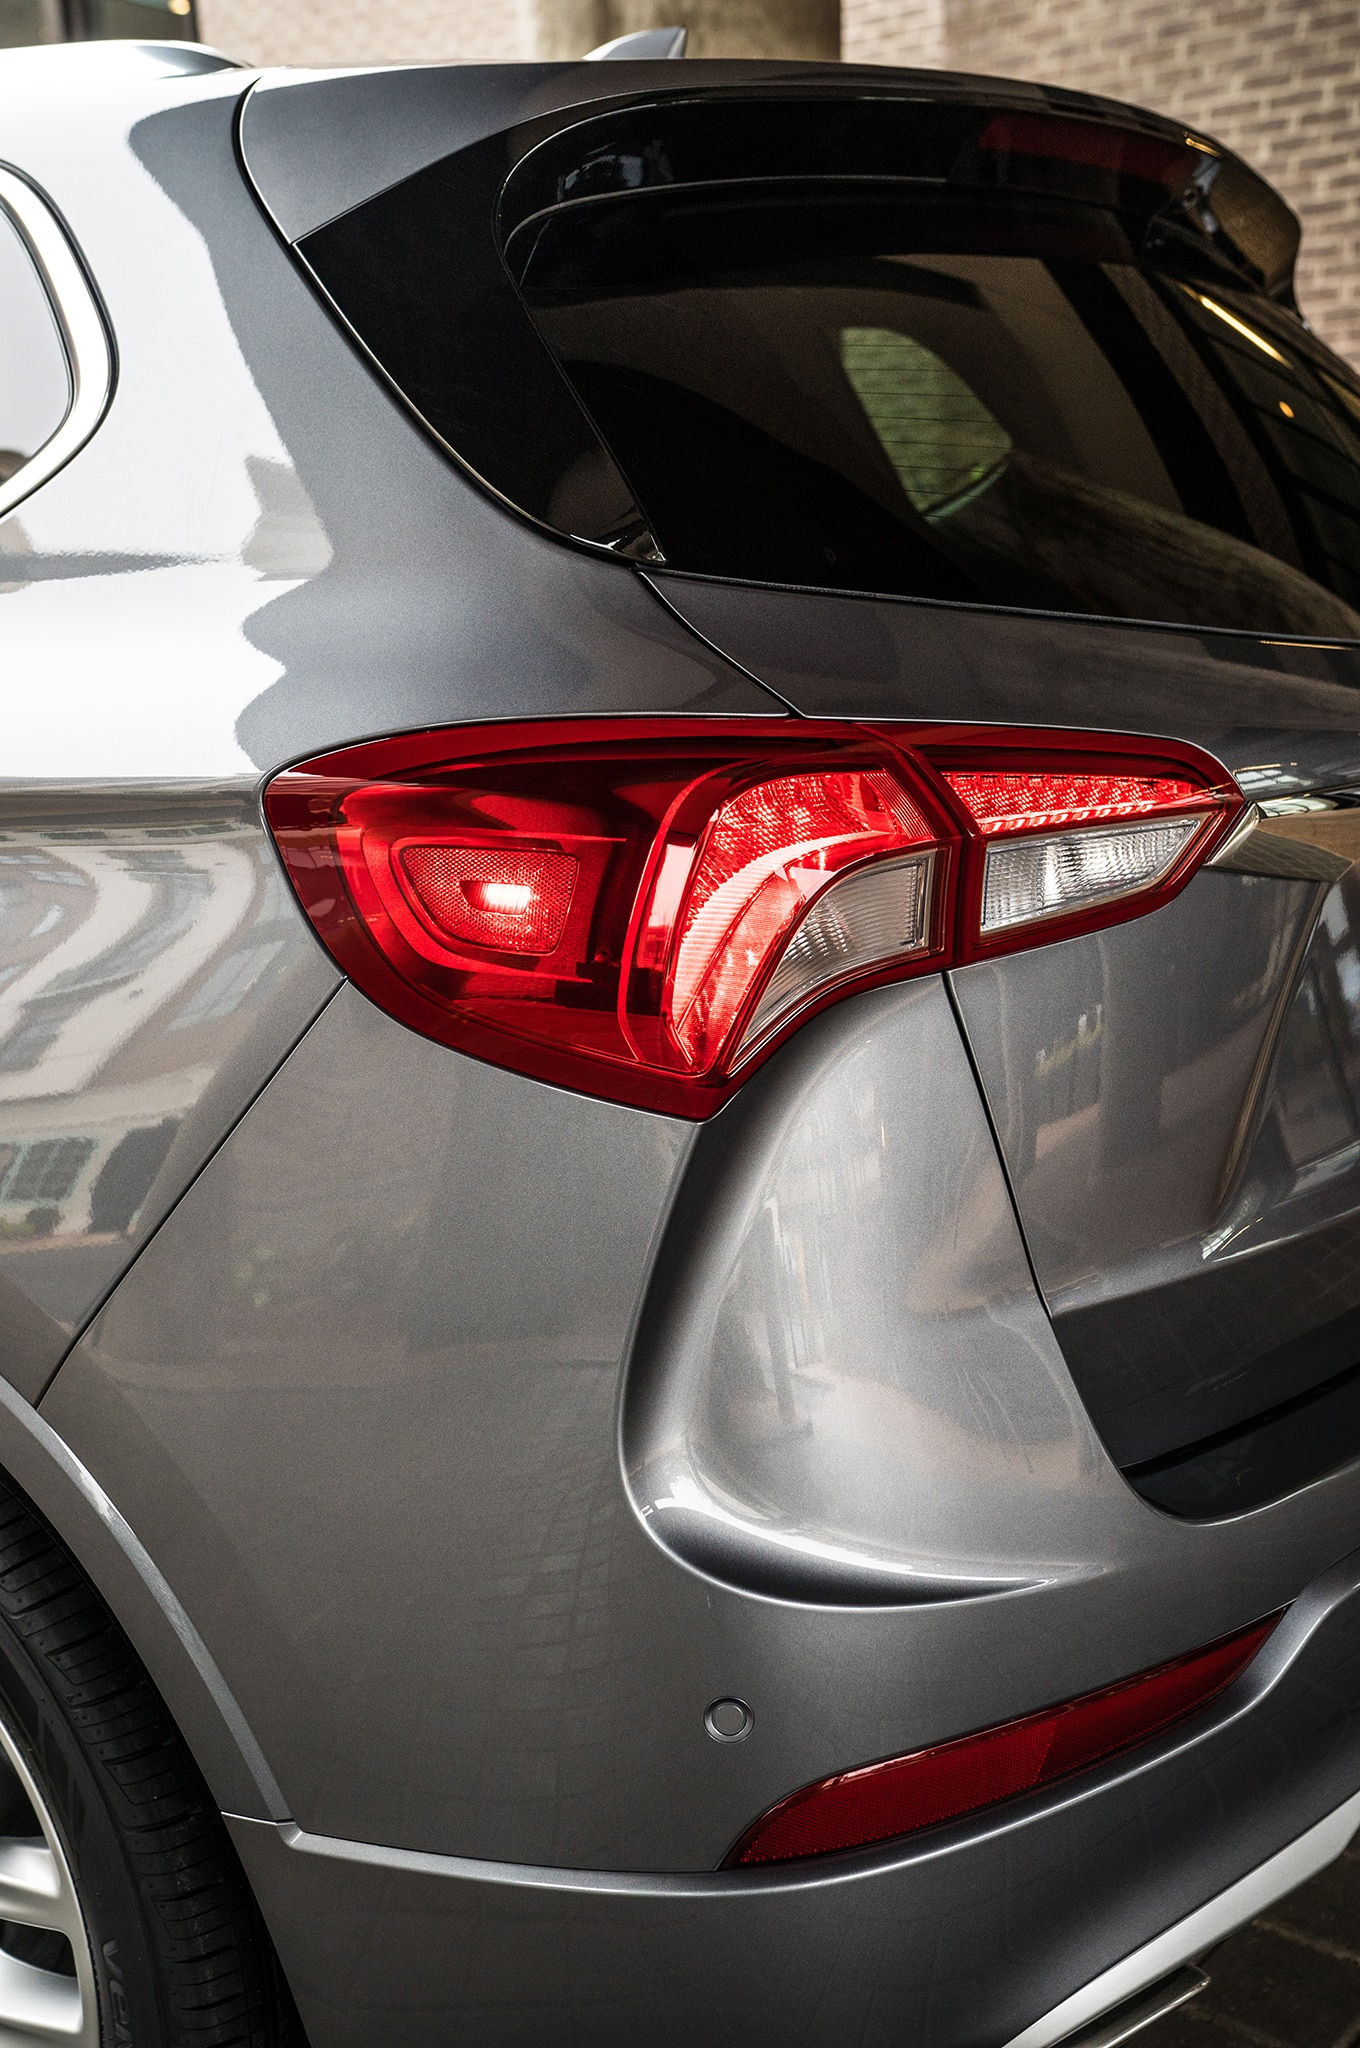 First Drive: 2019 Buick Envision Premium II | Automobile ...